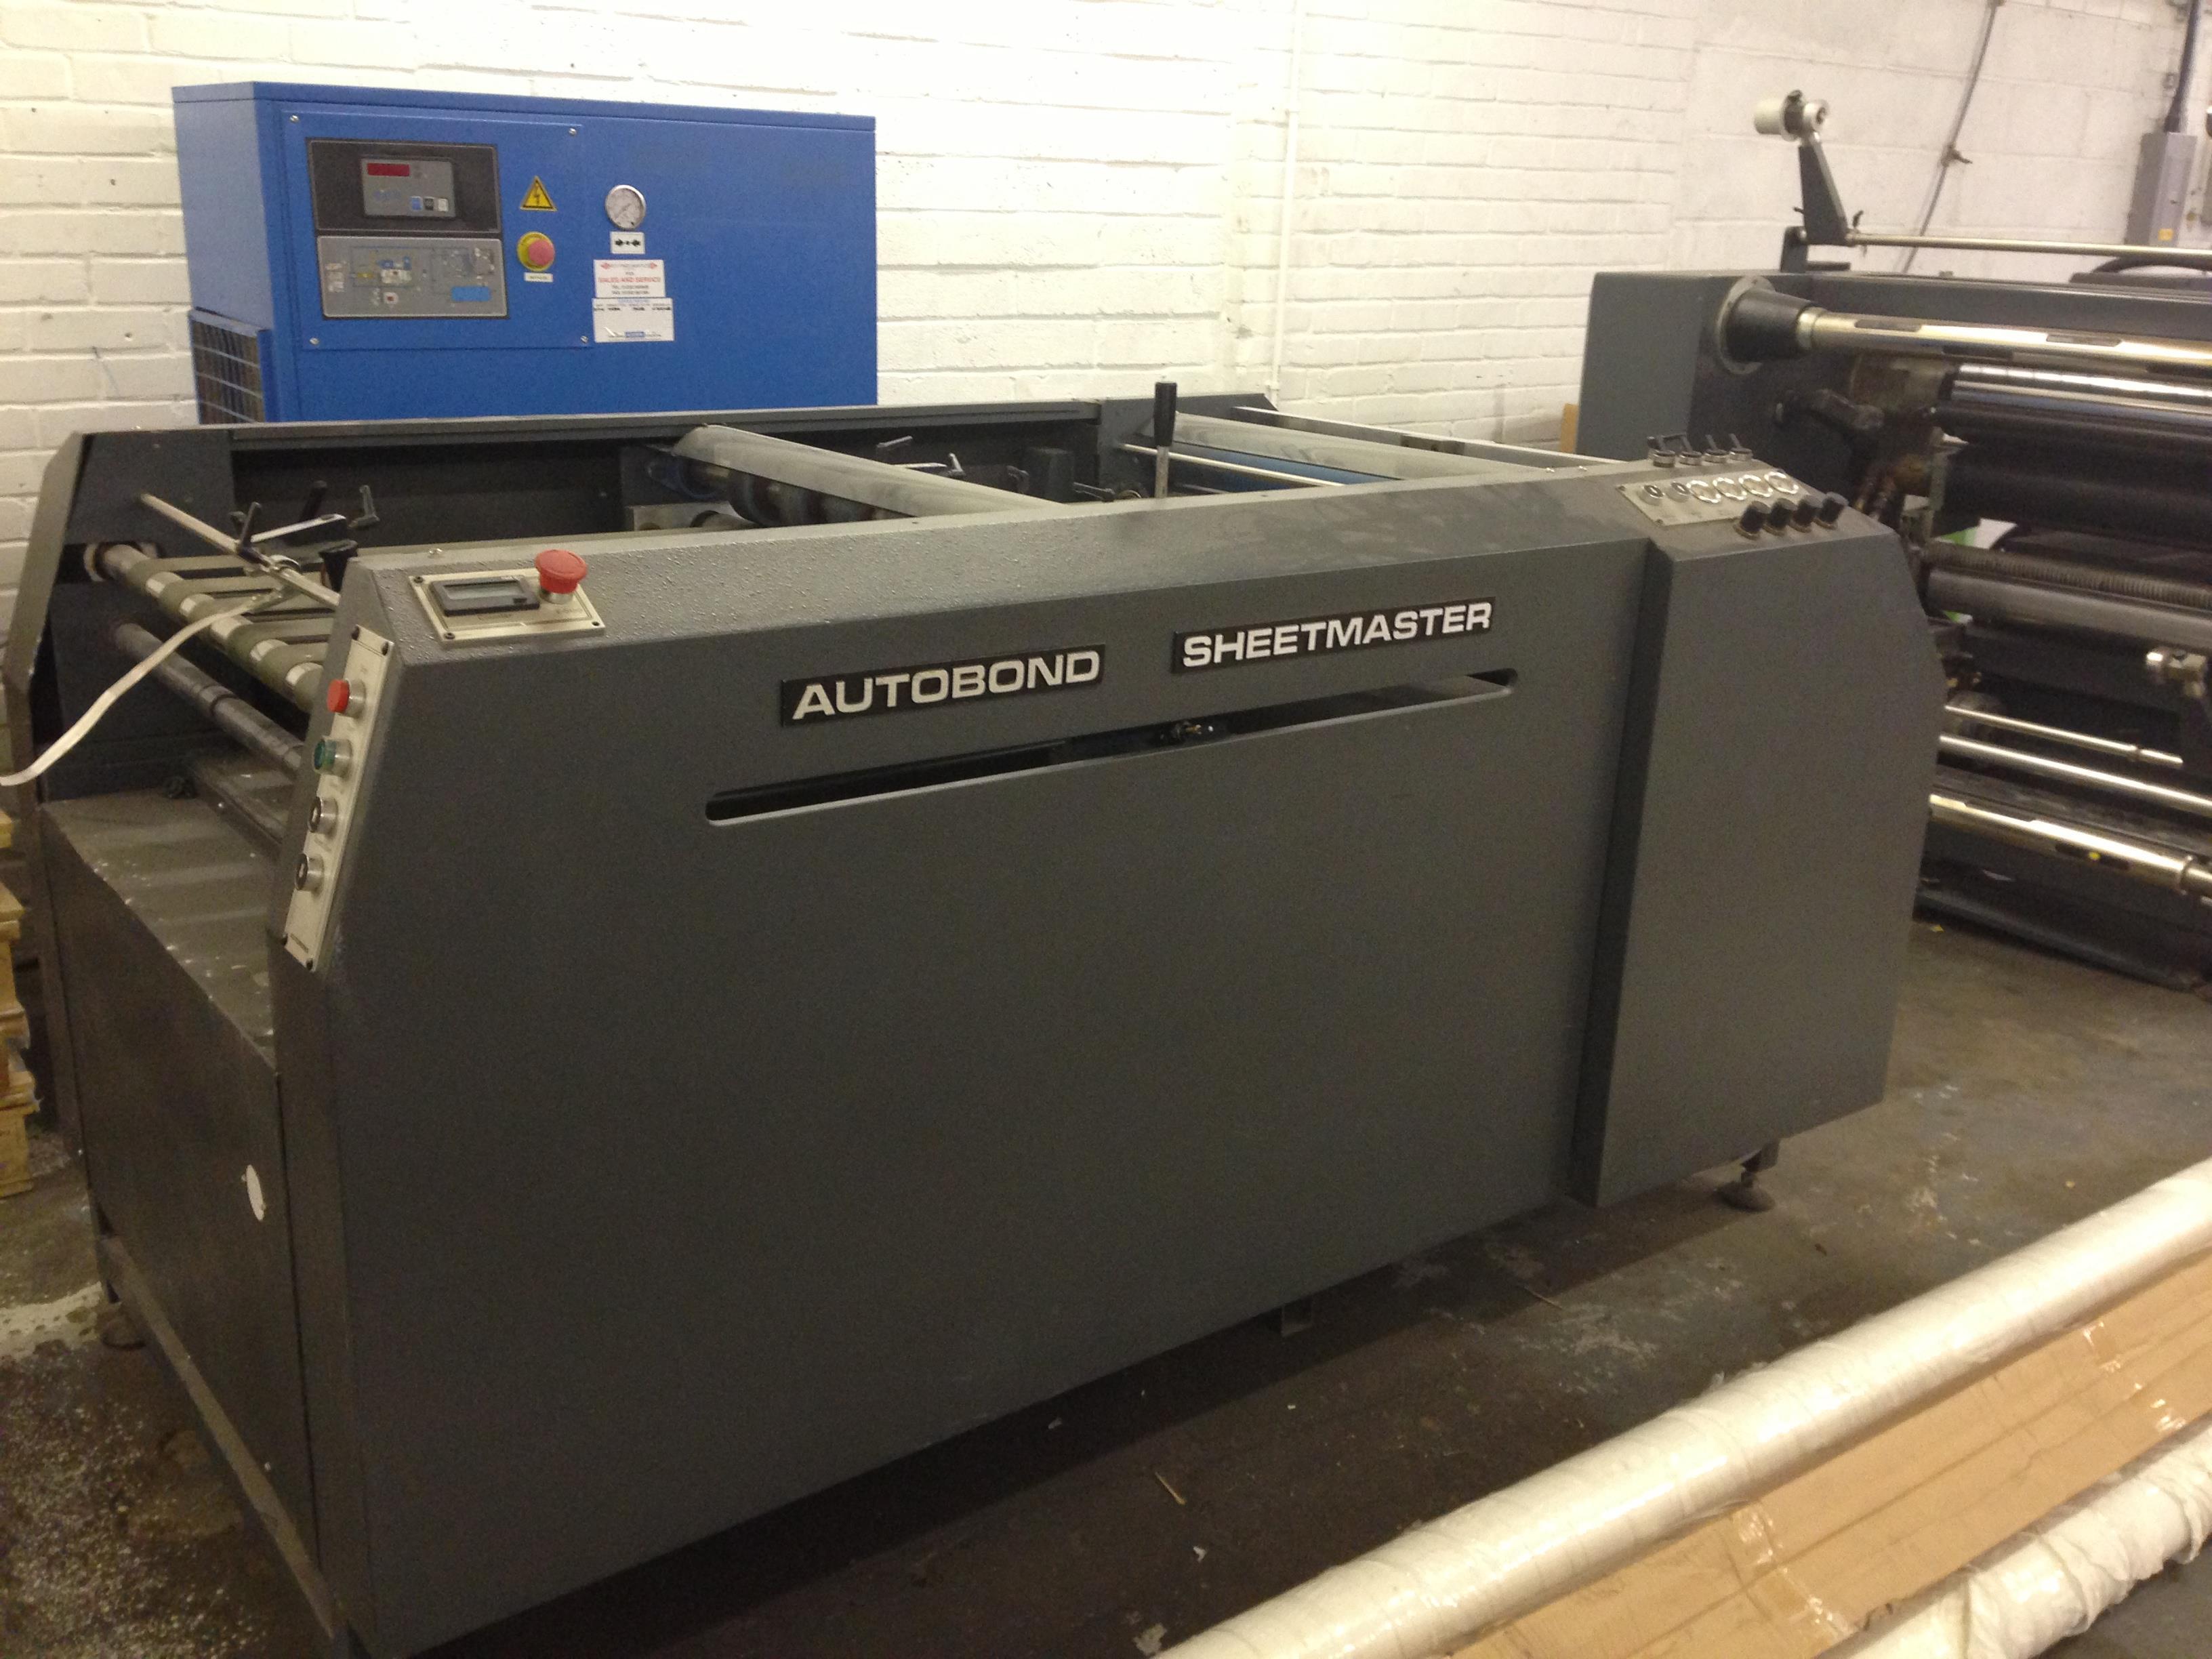 AUTOBOND LAMINATOR - SHEETMASTER 102